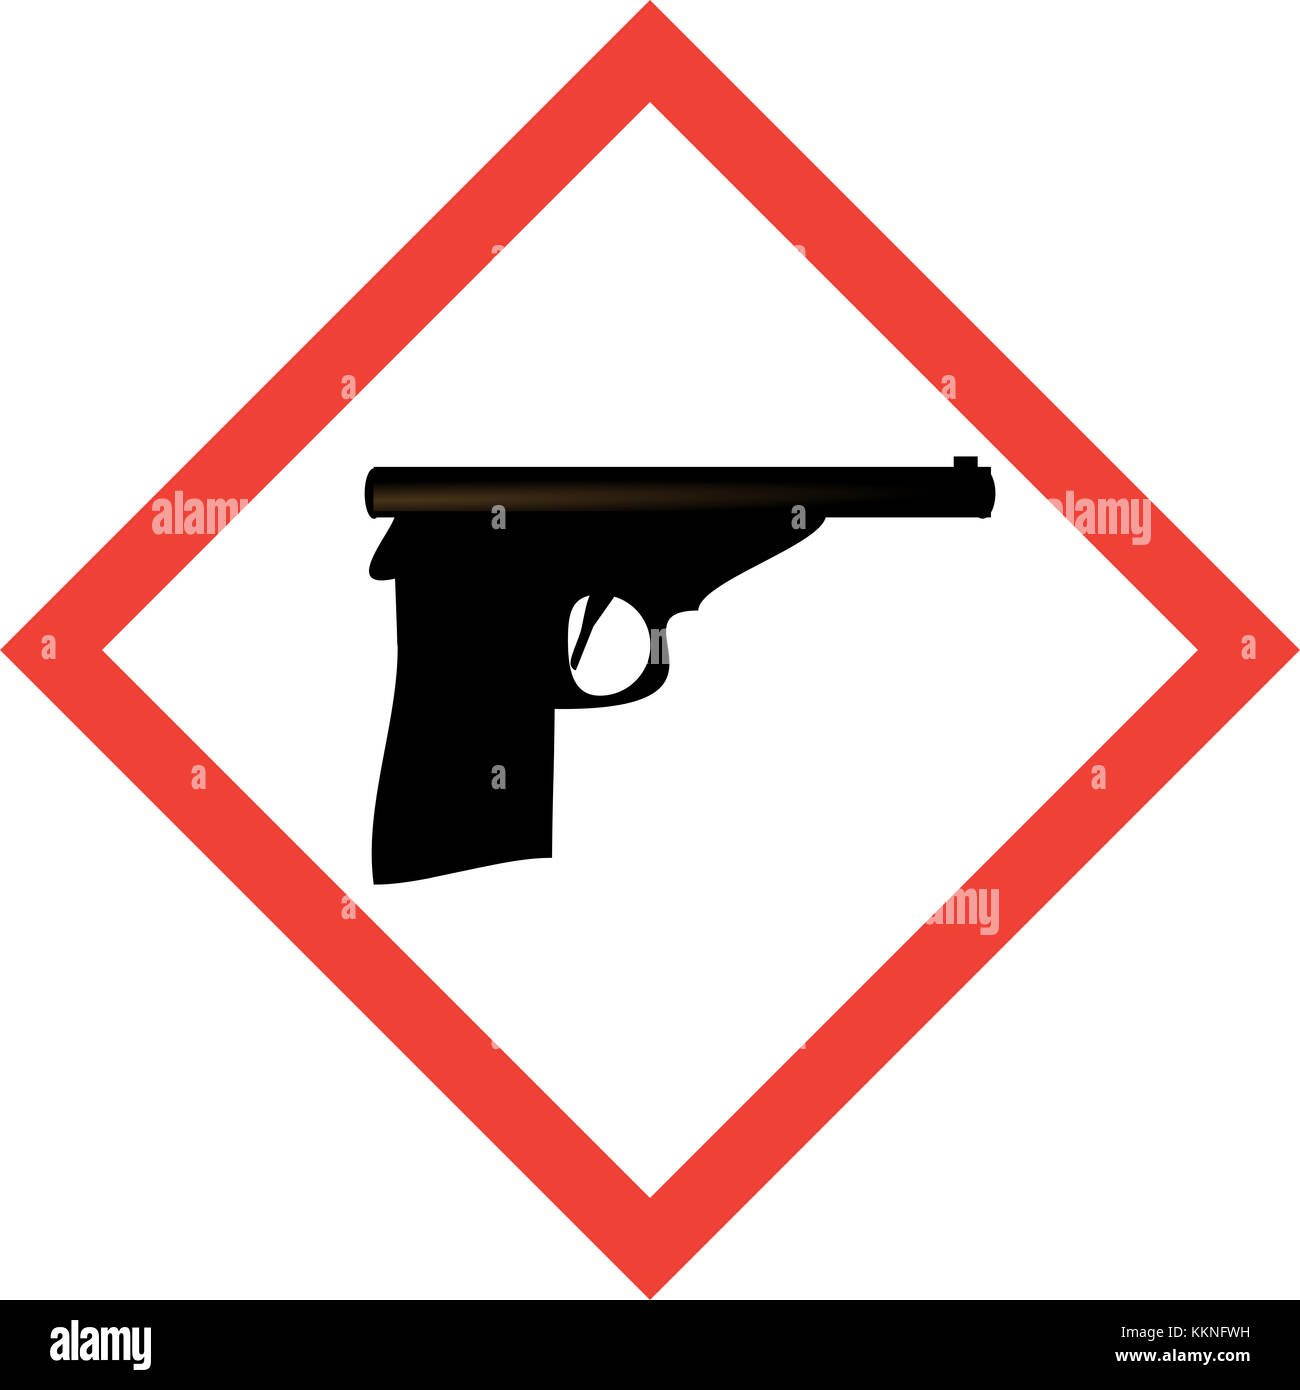 Hazard sign with gun symbol stock photo royalty free image hazard sign with gun symbol biocorpaavc